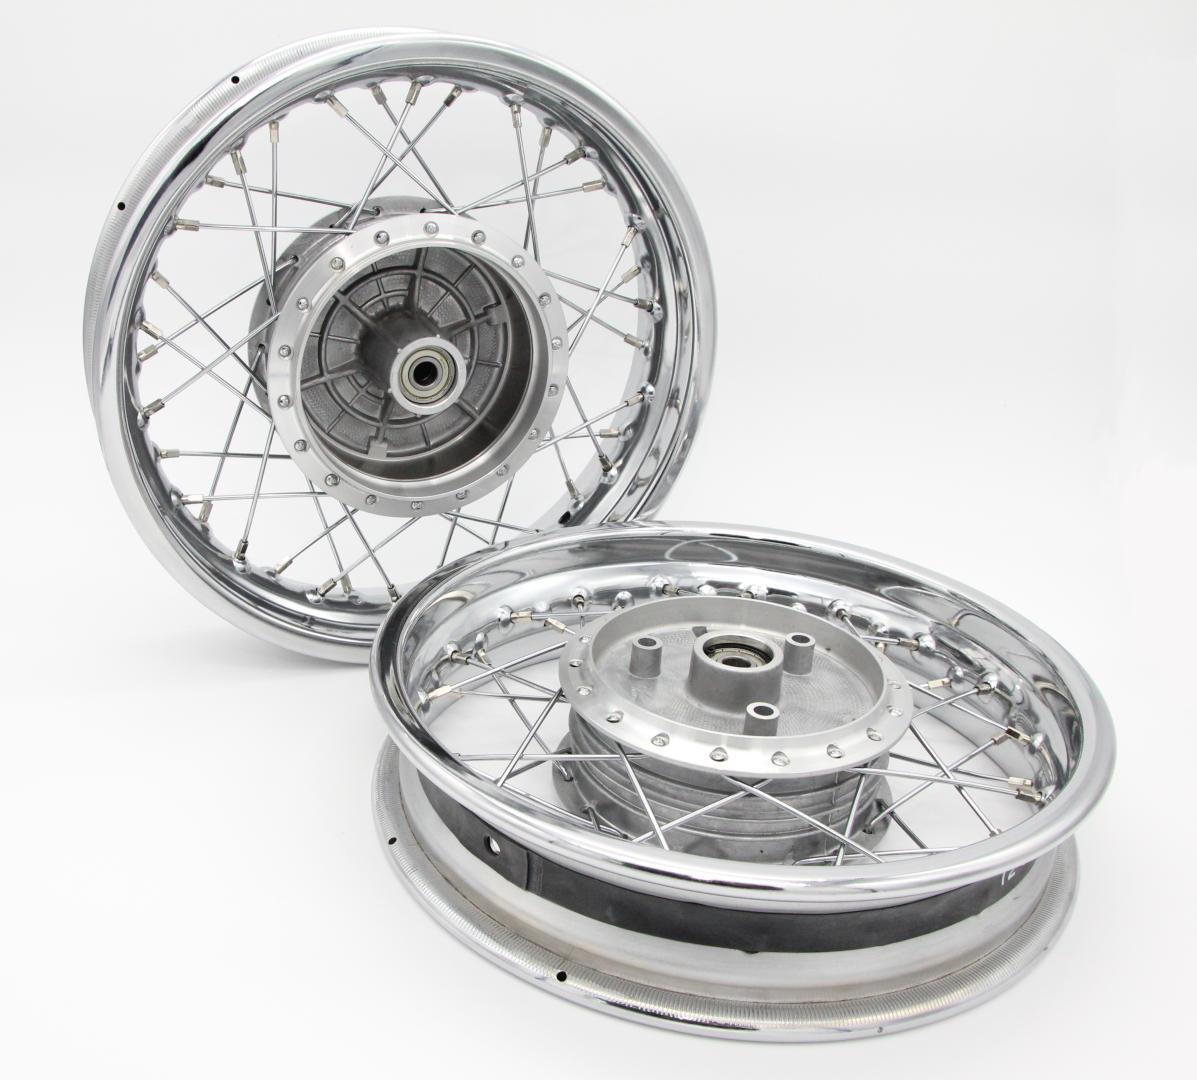 Simson SR50/SR80 Speichenrad 2,15x12 (2 Stück-Paar)